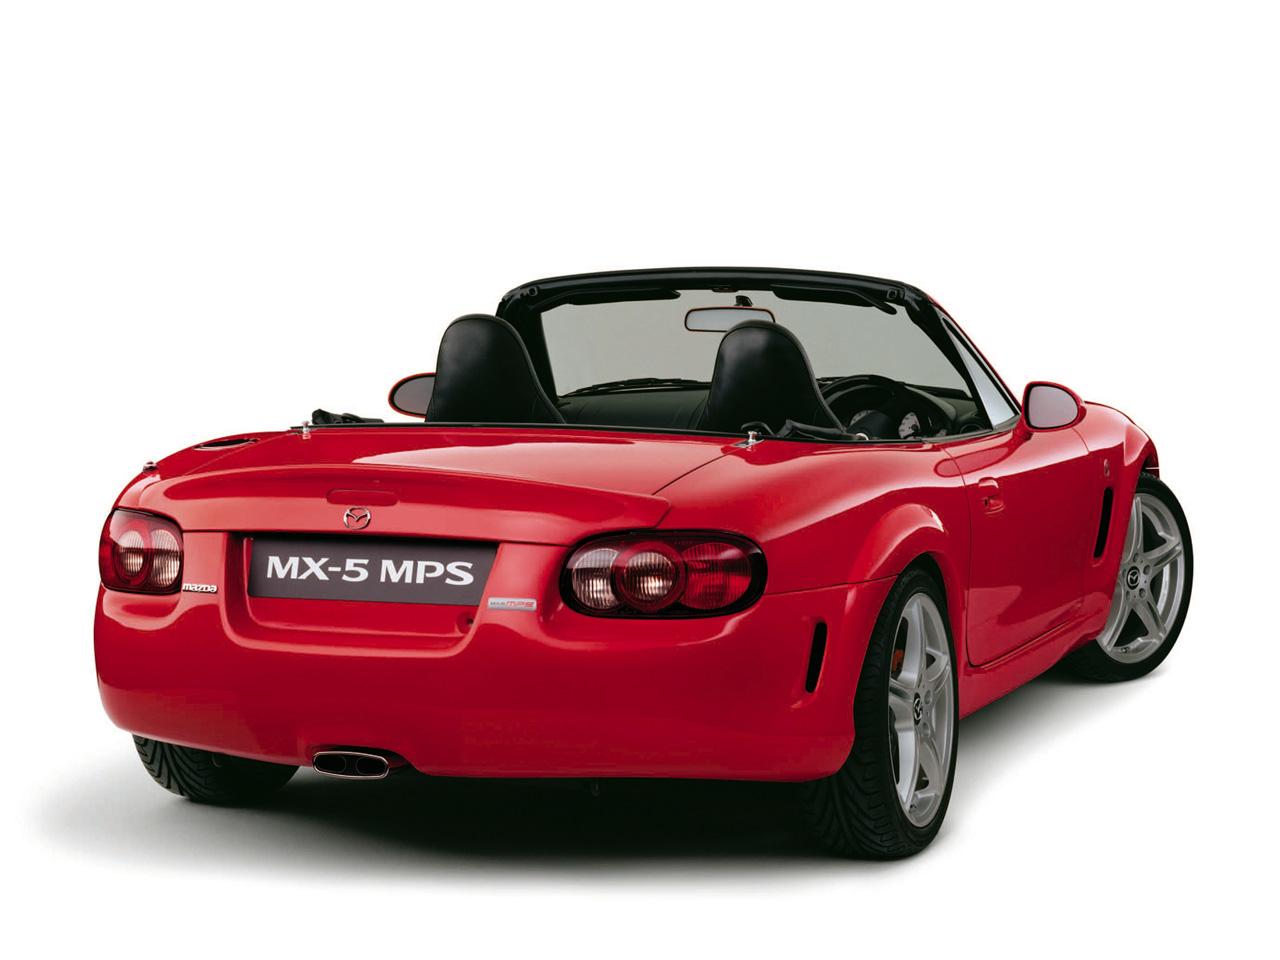 Mazda MX-5 MPS Concept, 日本車, スポーツカー, オープンカー, マツダ, NB, druga generacja